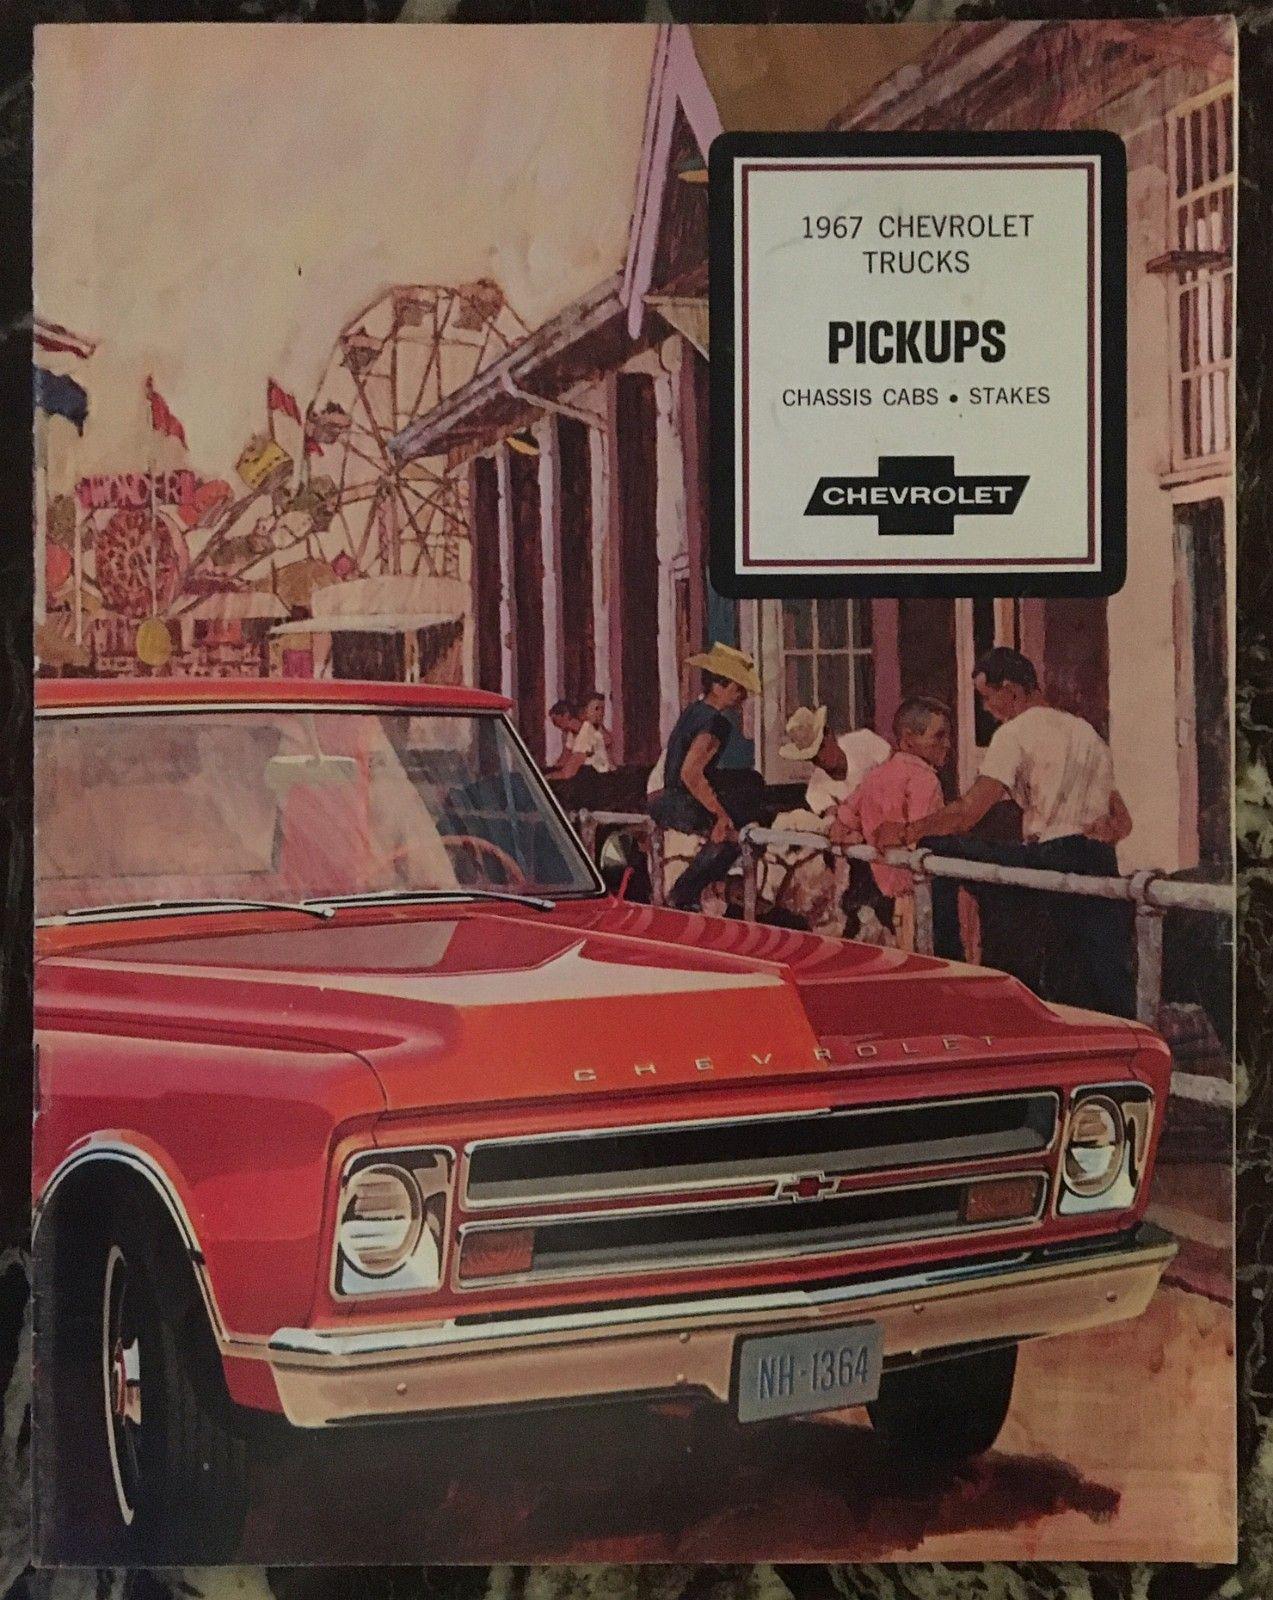 Original brosjyre til Chevrolet Pickup modellene for 1967 modell - Bergen  - Original brosjyre til Chevrolet Pickup modellene for 1967 modell   En fantastisk flott og original brosjyre som dekker hele Pick up programmet til Chevrolet for modellåret 1967. 16 sider i A4 format, og i farger.     I - Bergen